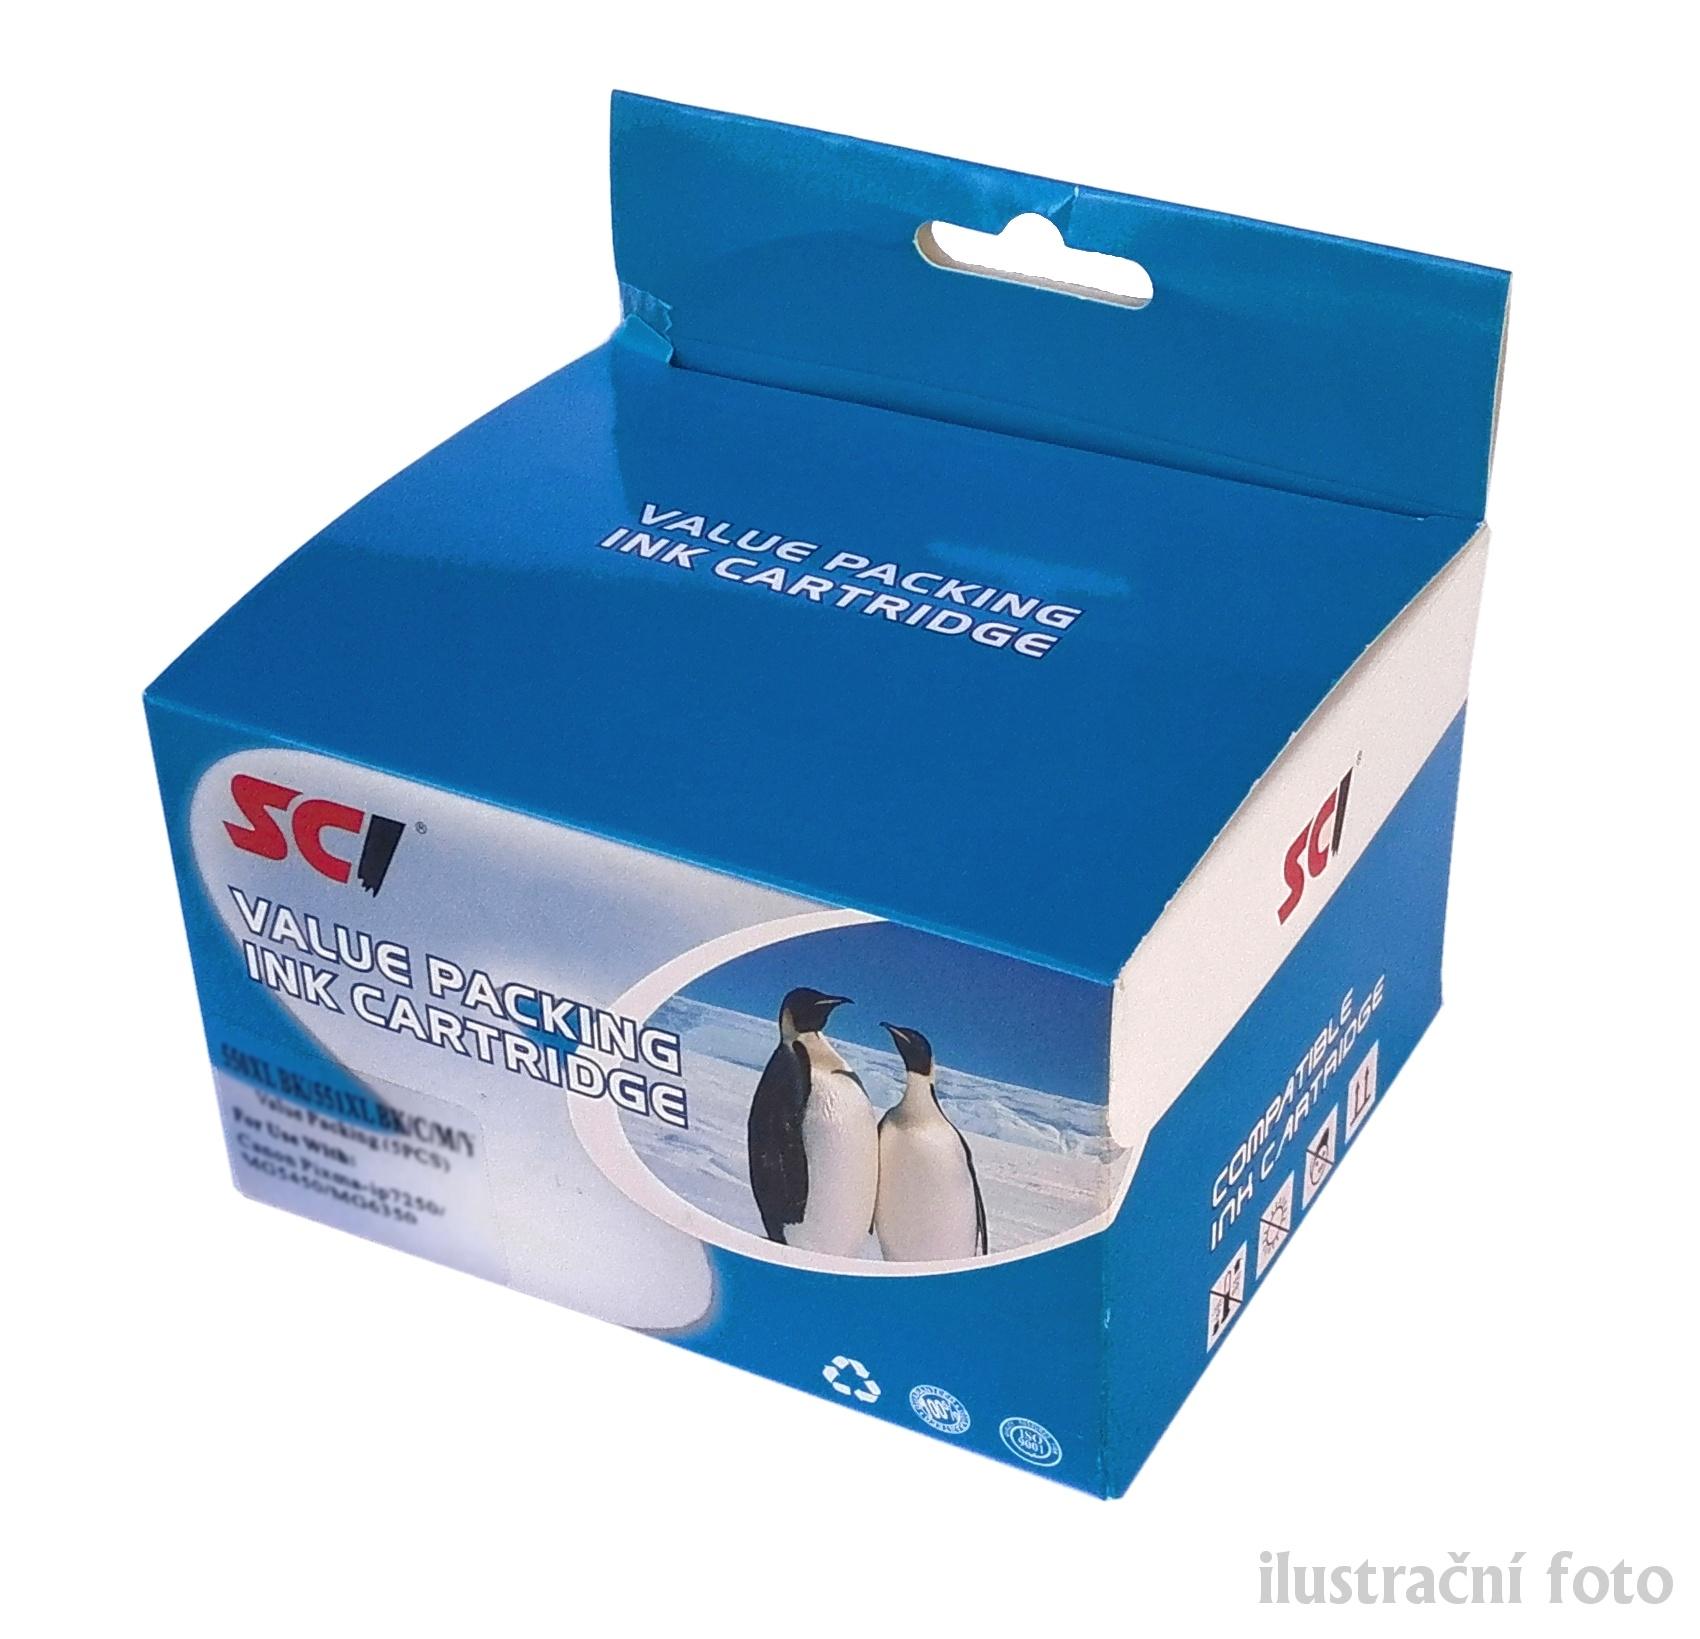 Canon multipack CLI-571 Bk/C/M/Y XL + PGI-570Bk XL Compatible Kompatibilní cartridge Canon CLI571XL a PGI570XL - sada 5 barev